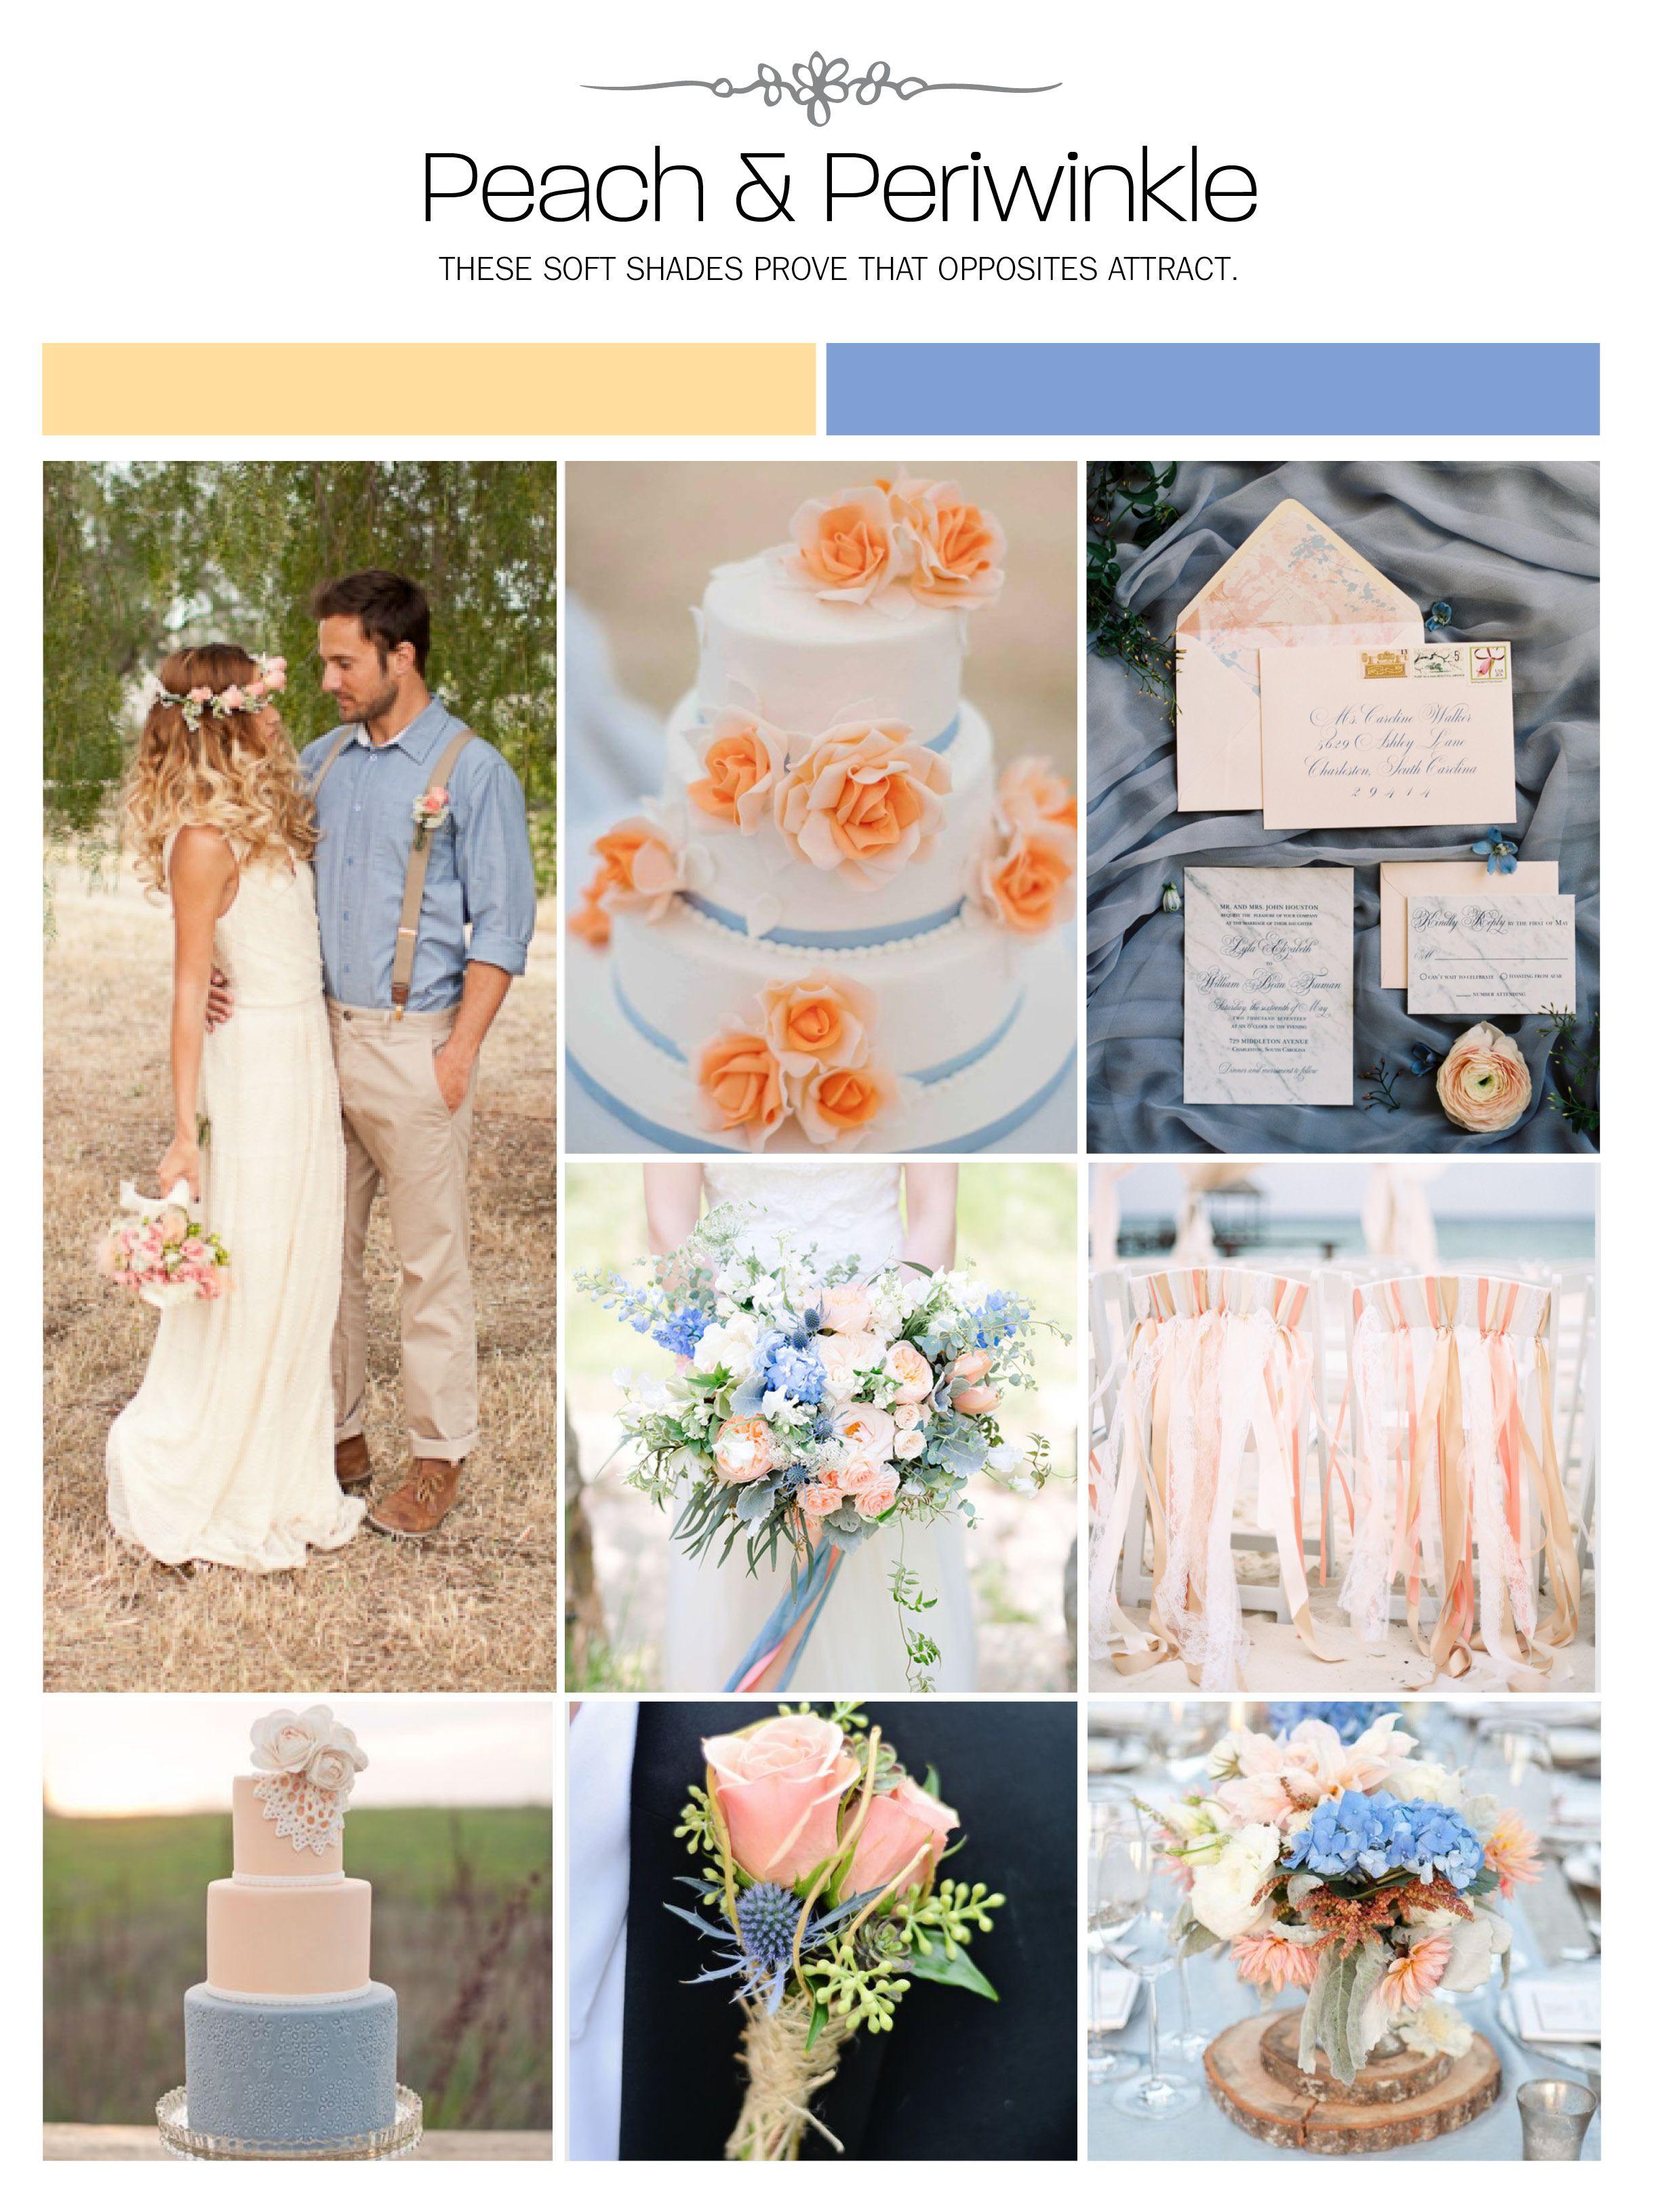 Inspiration board peach u periwinkle weddings illustrated